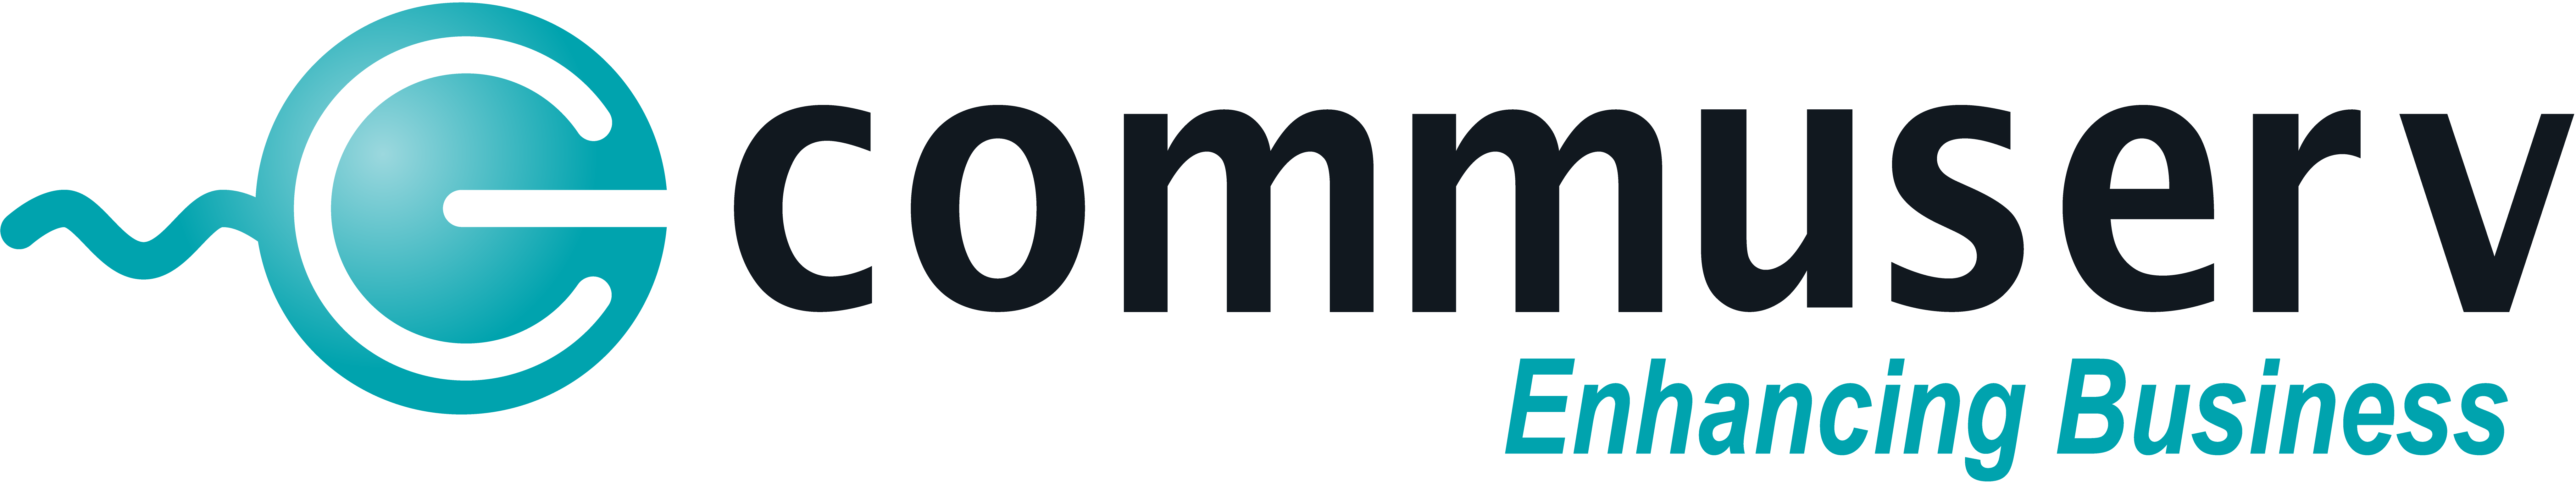 Commuserv